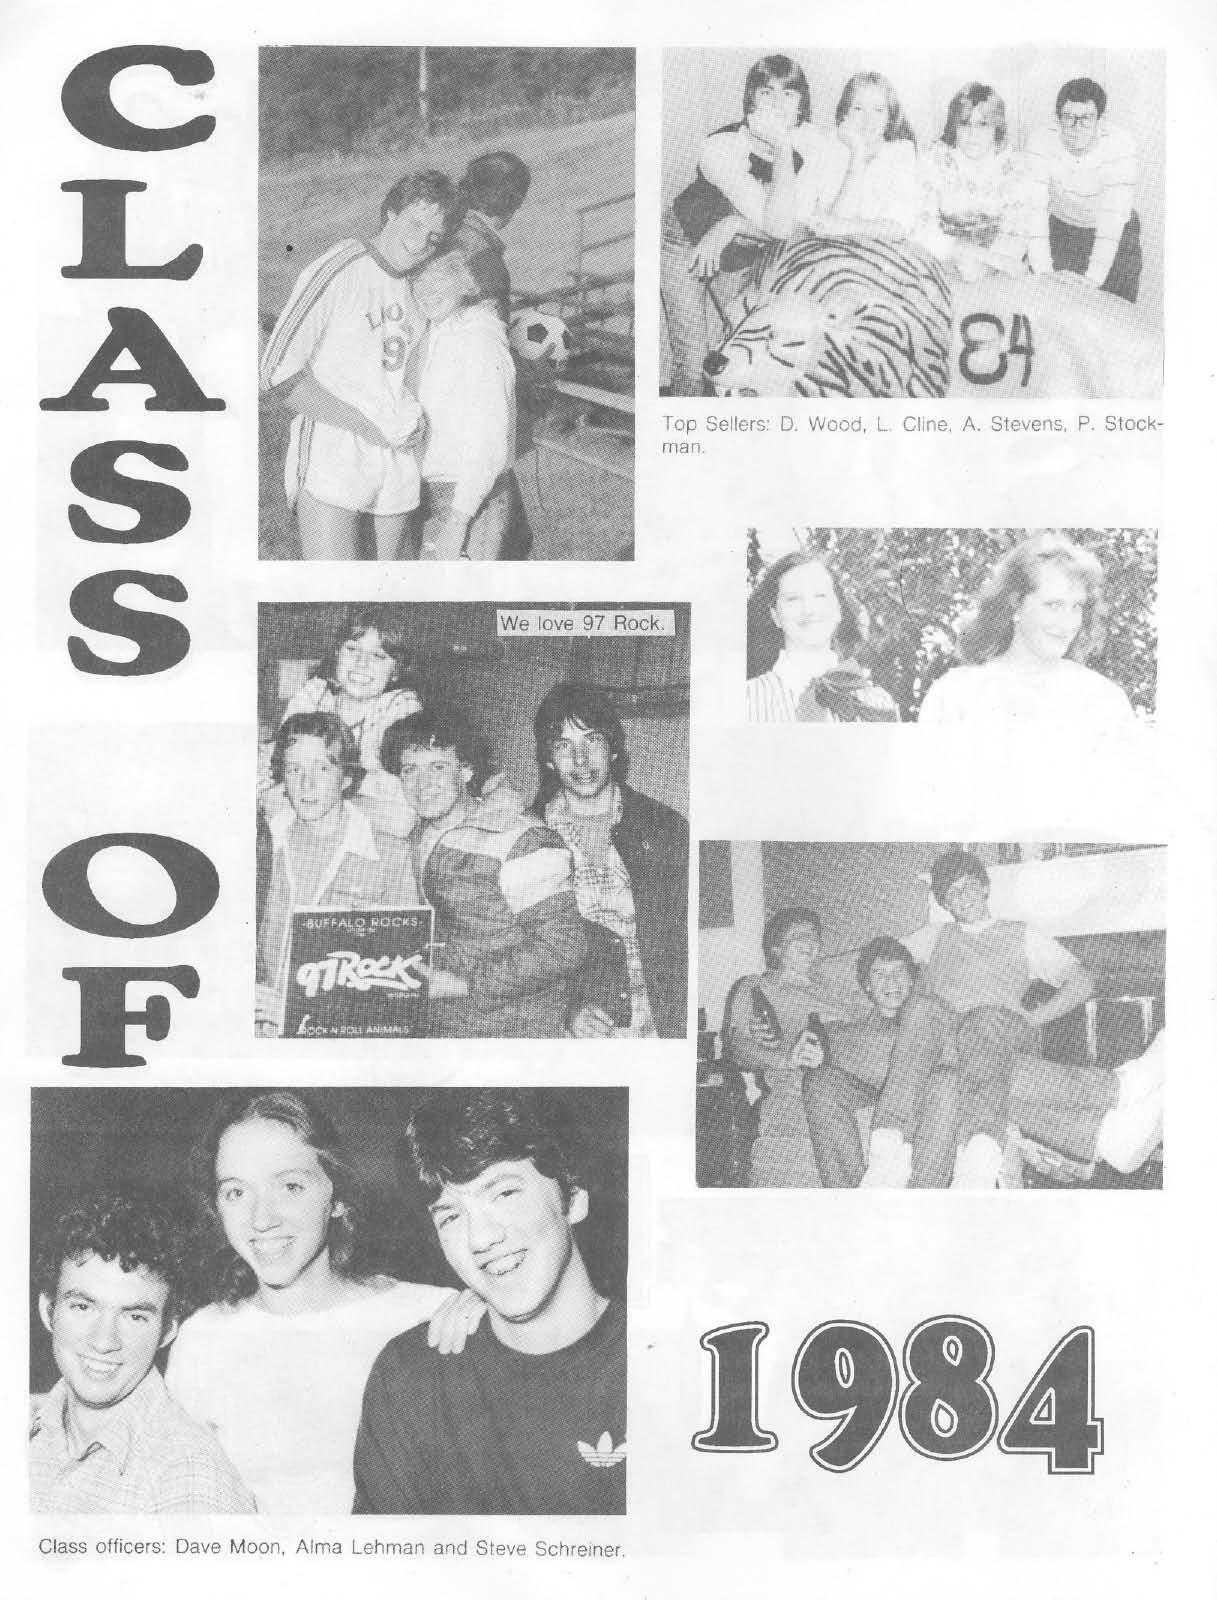 1994 1984